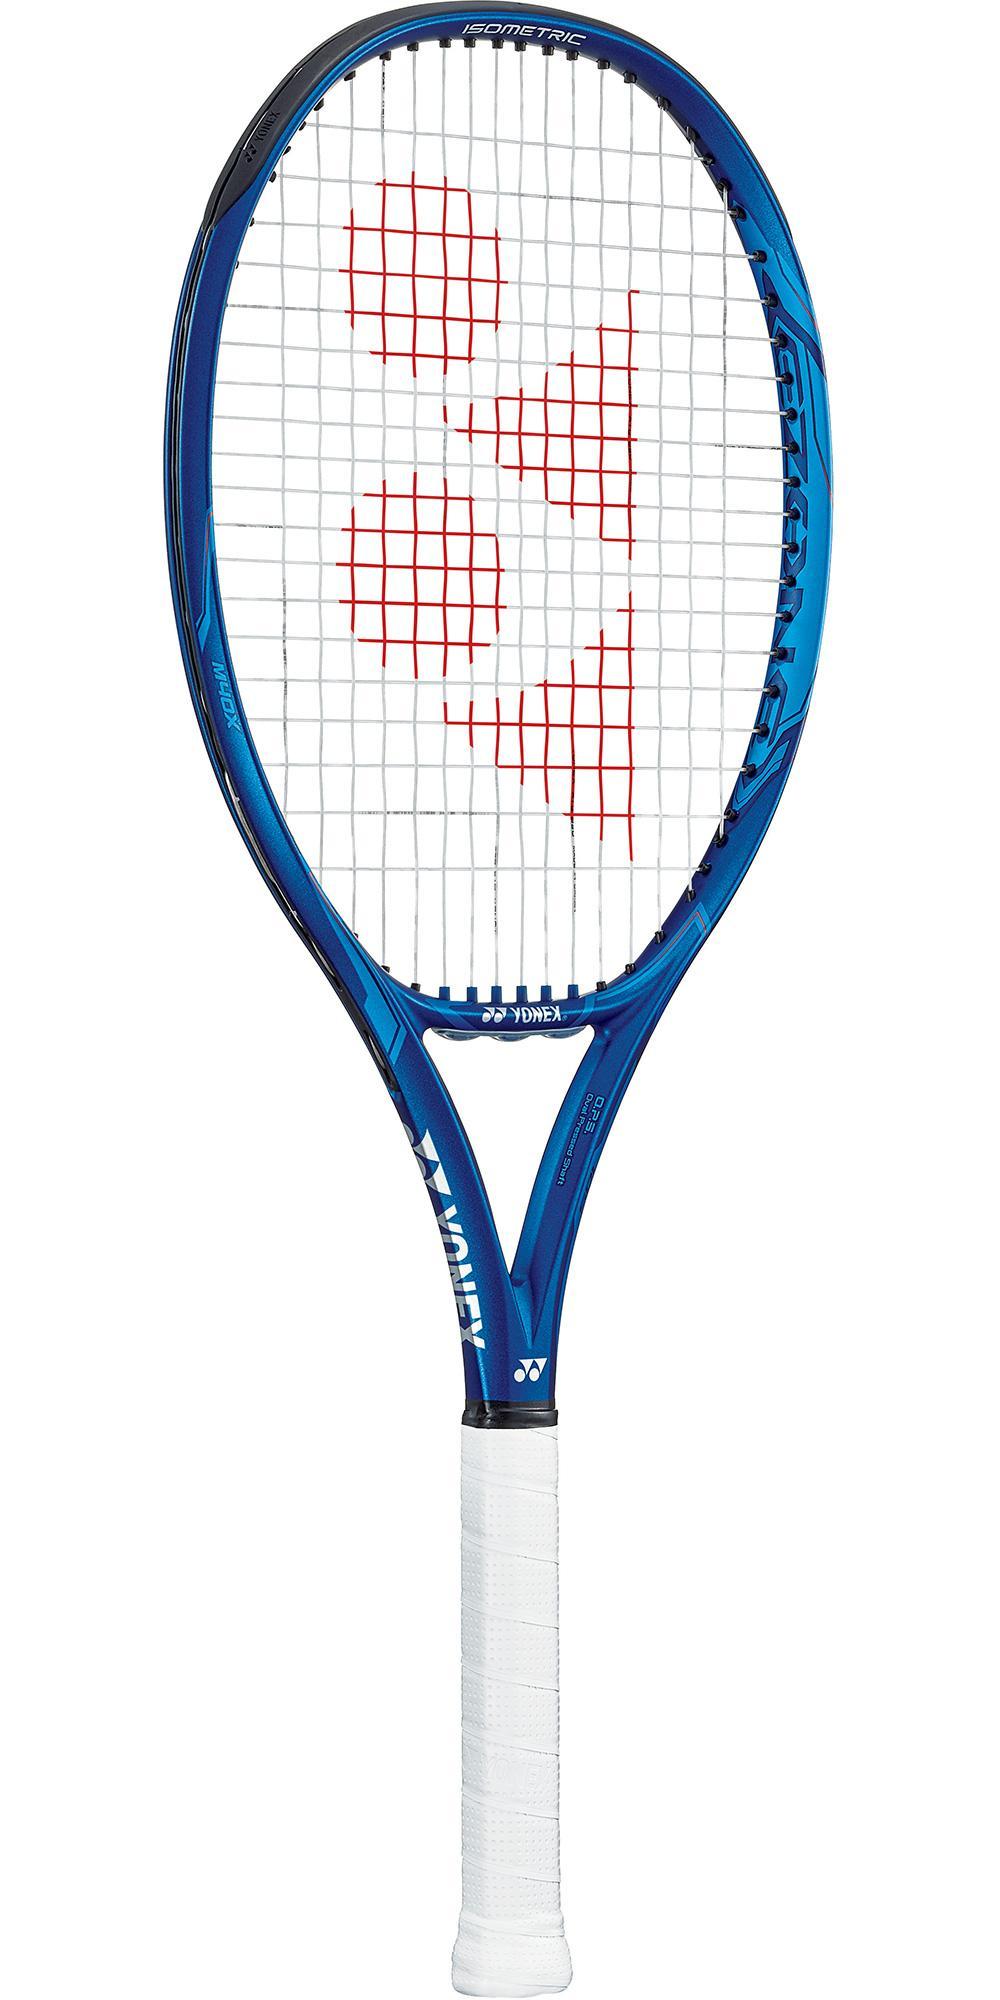 Raquete de Tênis Yonex Ezone 105 Azul L2